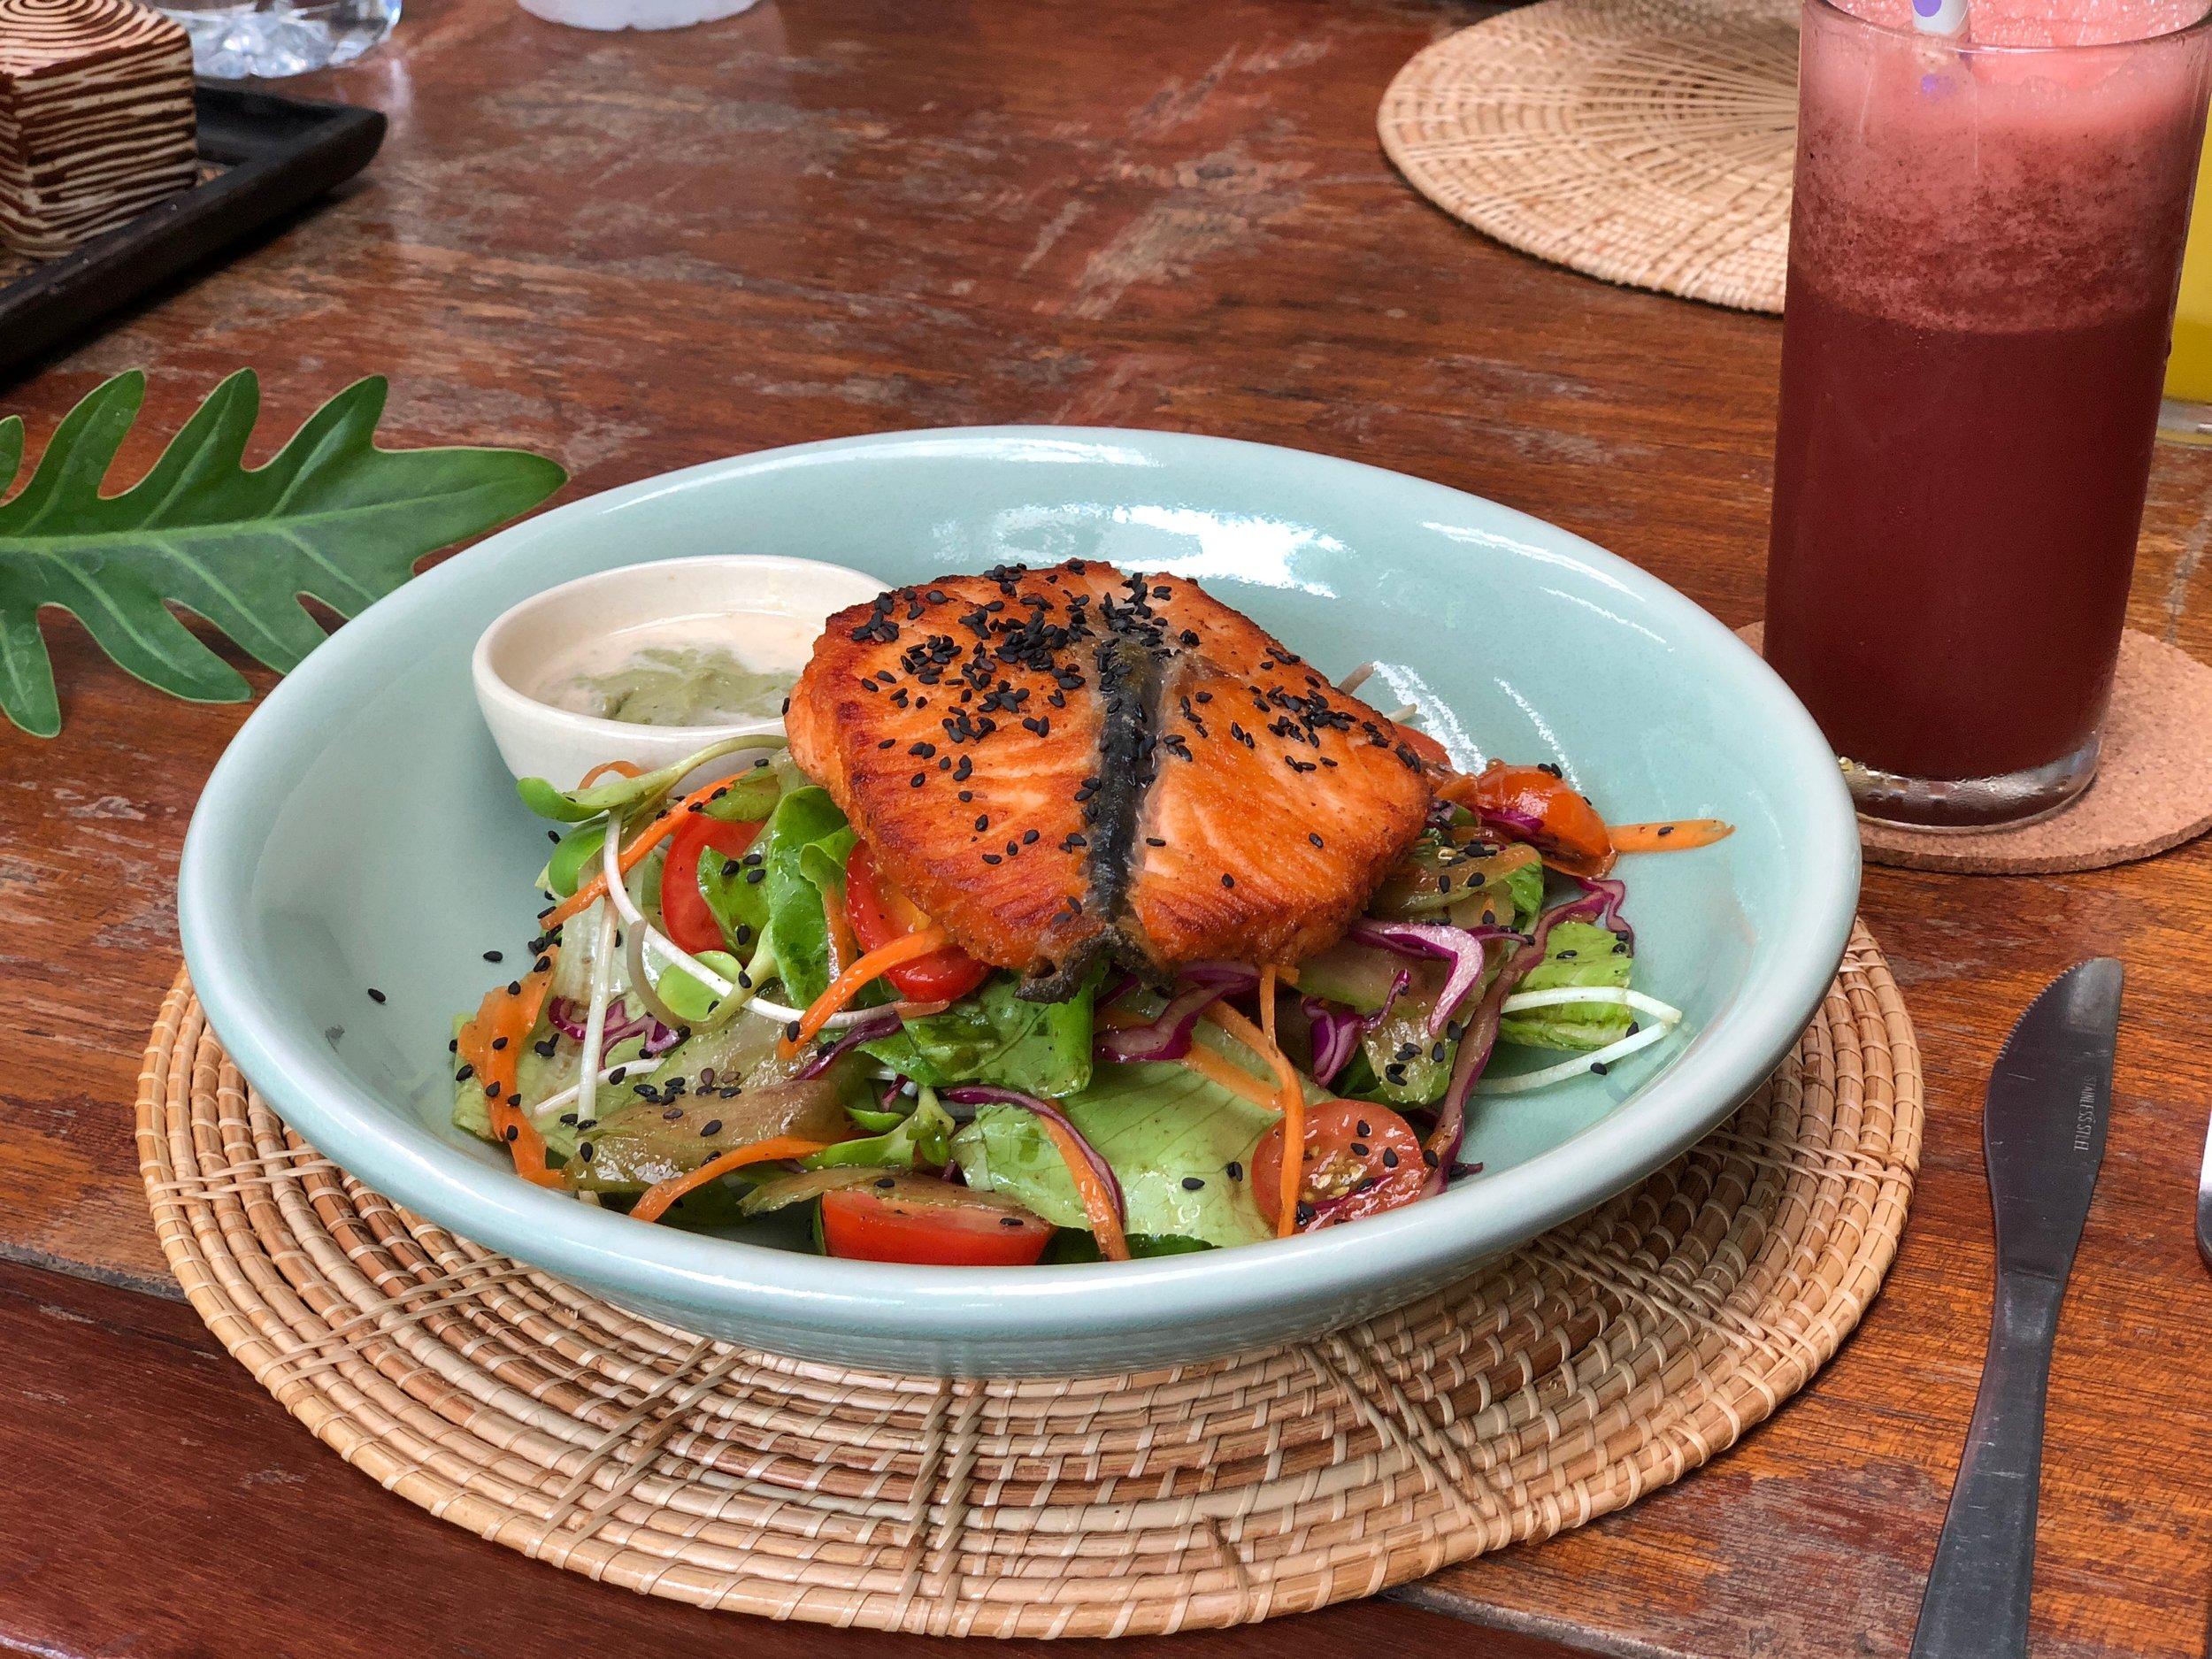 greenlight_salmon_salad.jpg